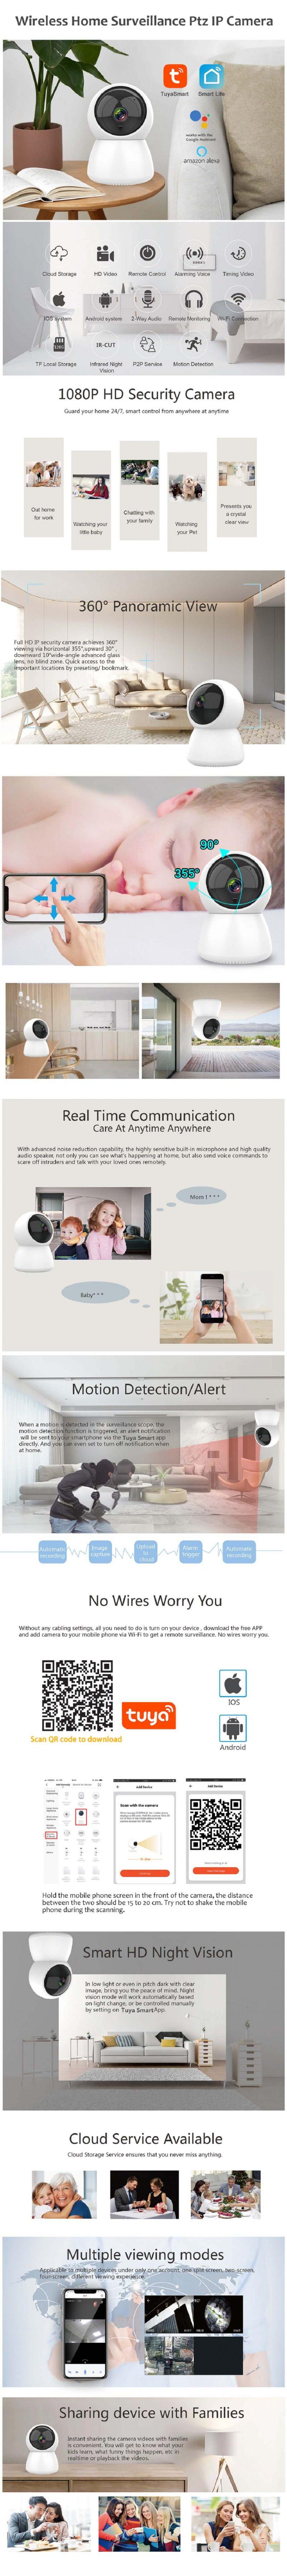 C240 Tuya WiFi IP Camera 1080P for Home Security